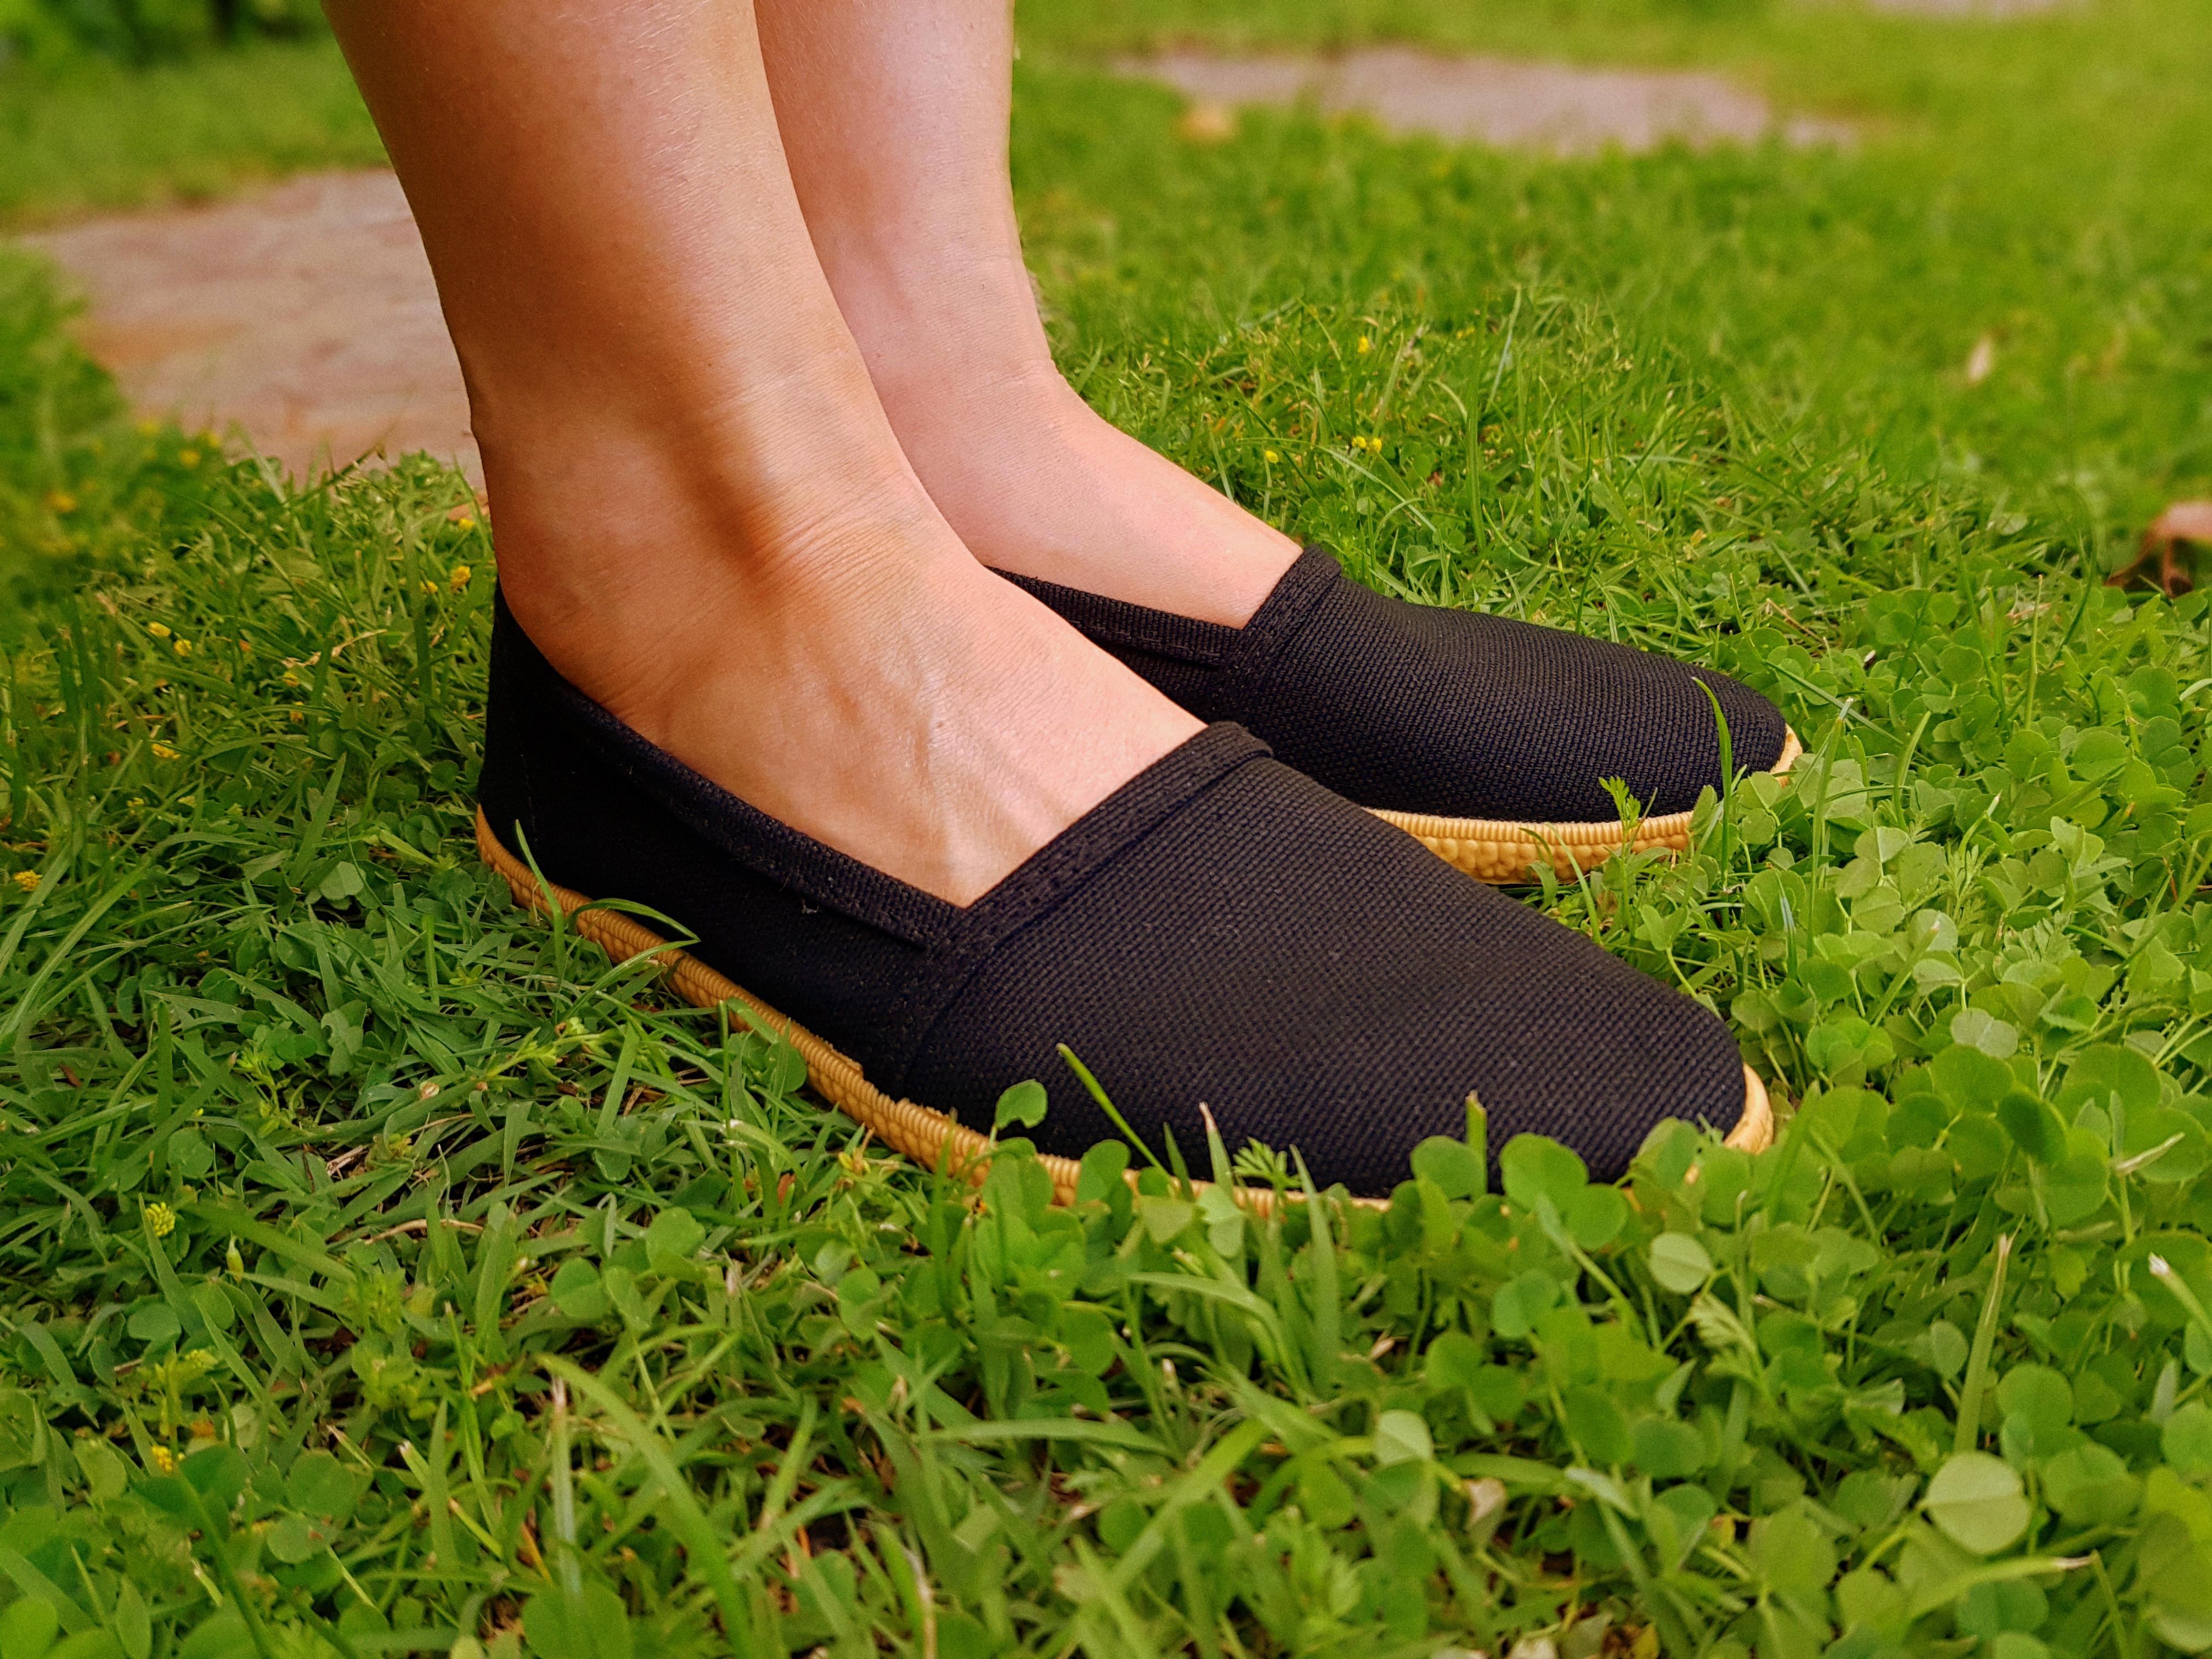 zapatillas camping negras con suela color marron caramelo